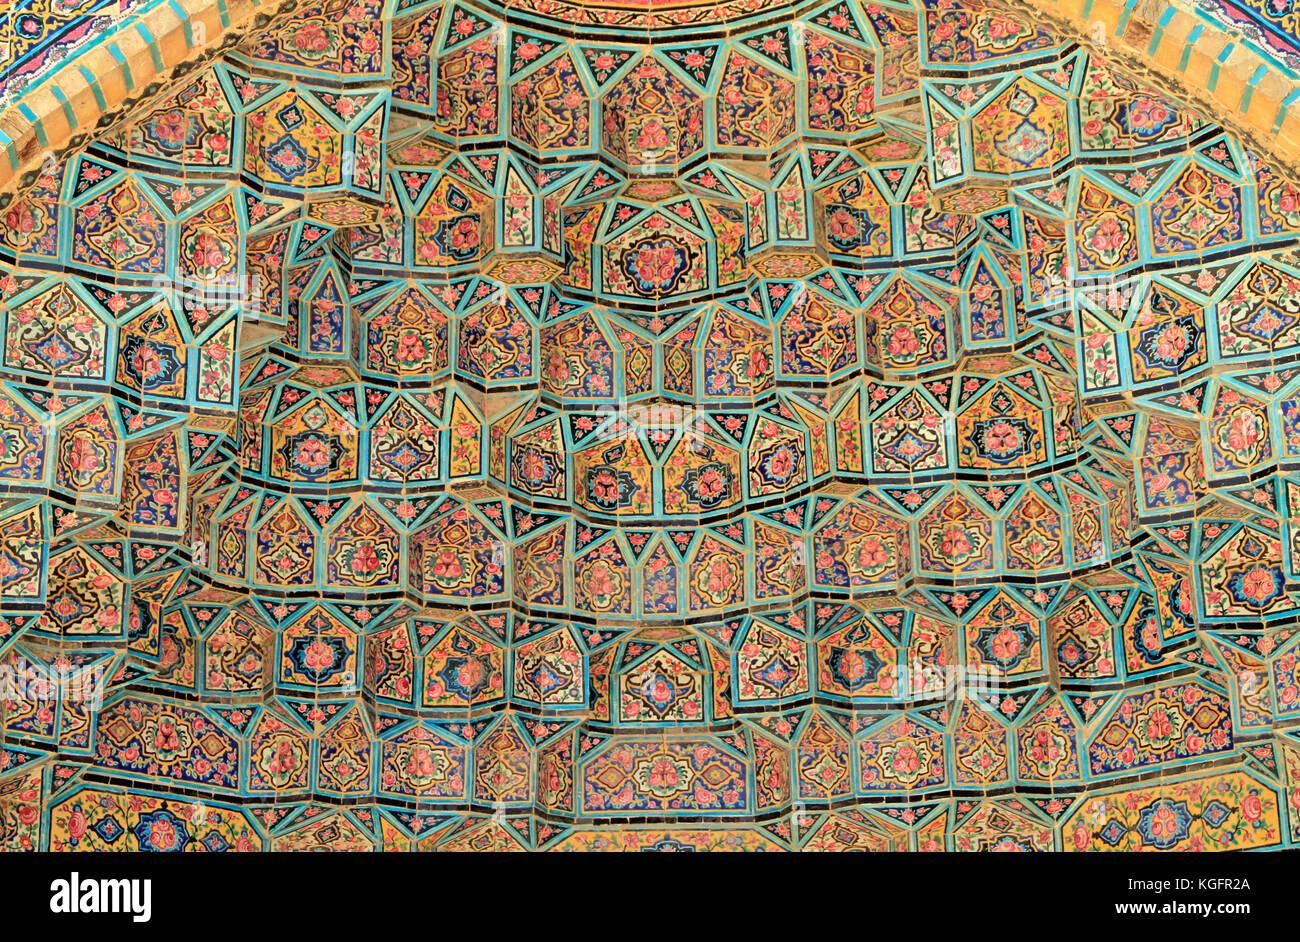 Detailed pattern of Nasir ol Molk mosque in Shiraz, Iran - Stock Image